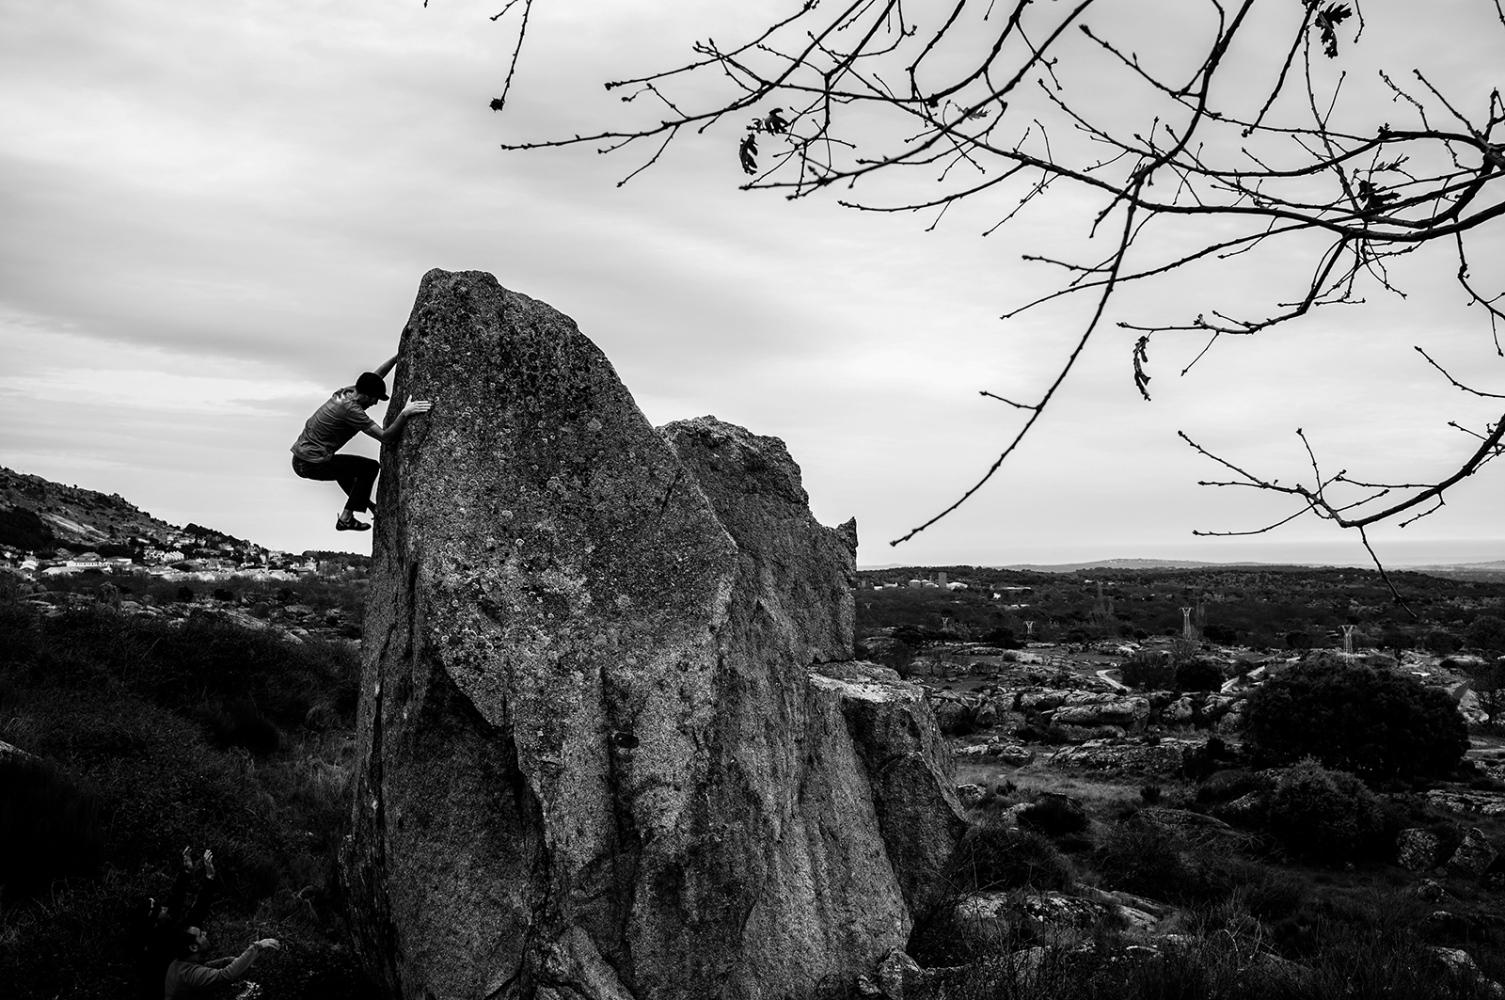 Art and Documentary Photography - Loading 3_David_Arribas_Boulders.jpg